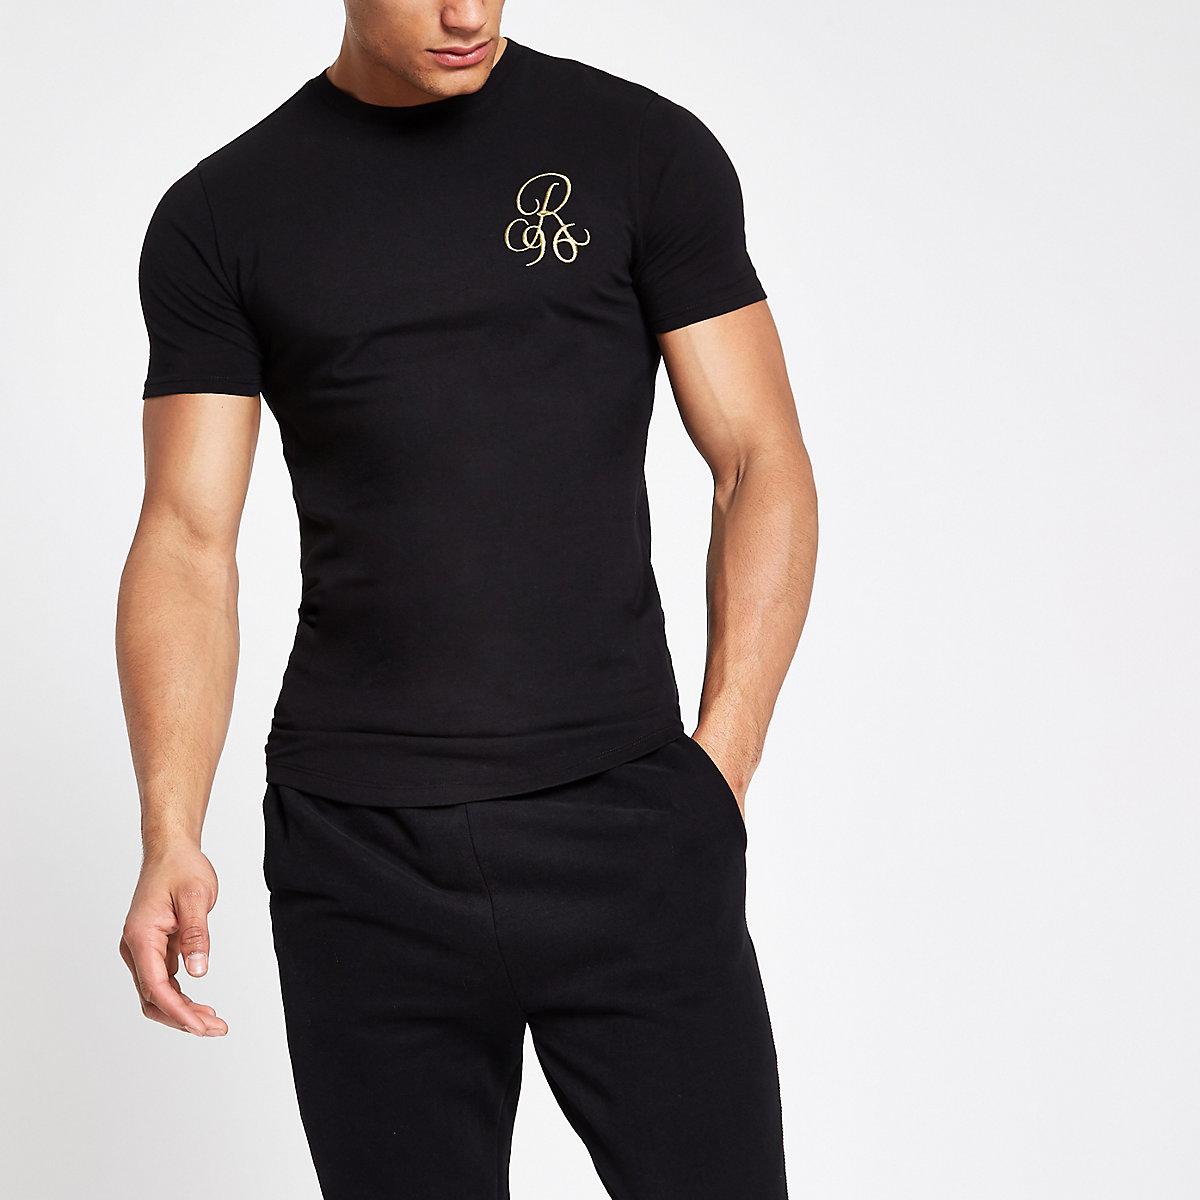 Black 'R96' muscle fit T-shirt